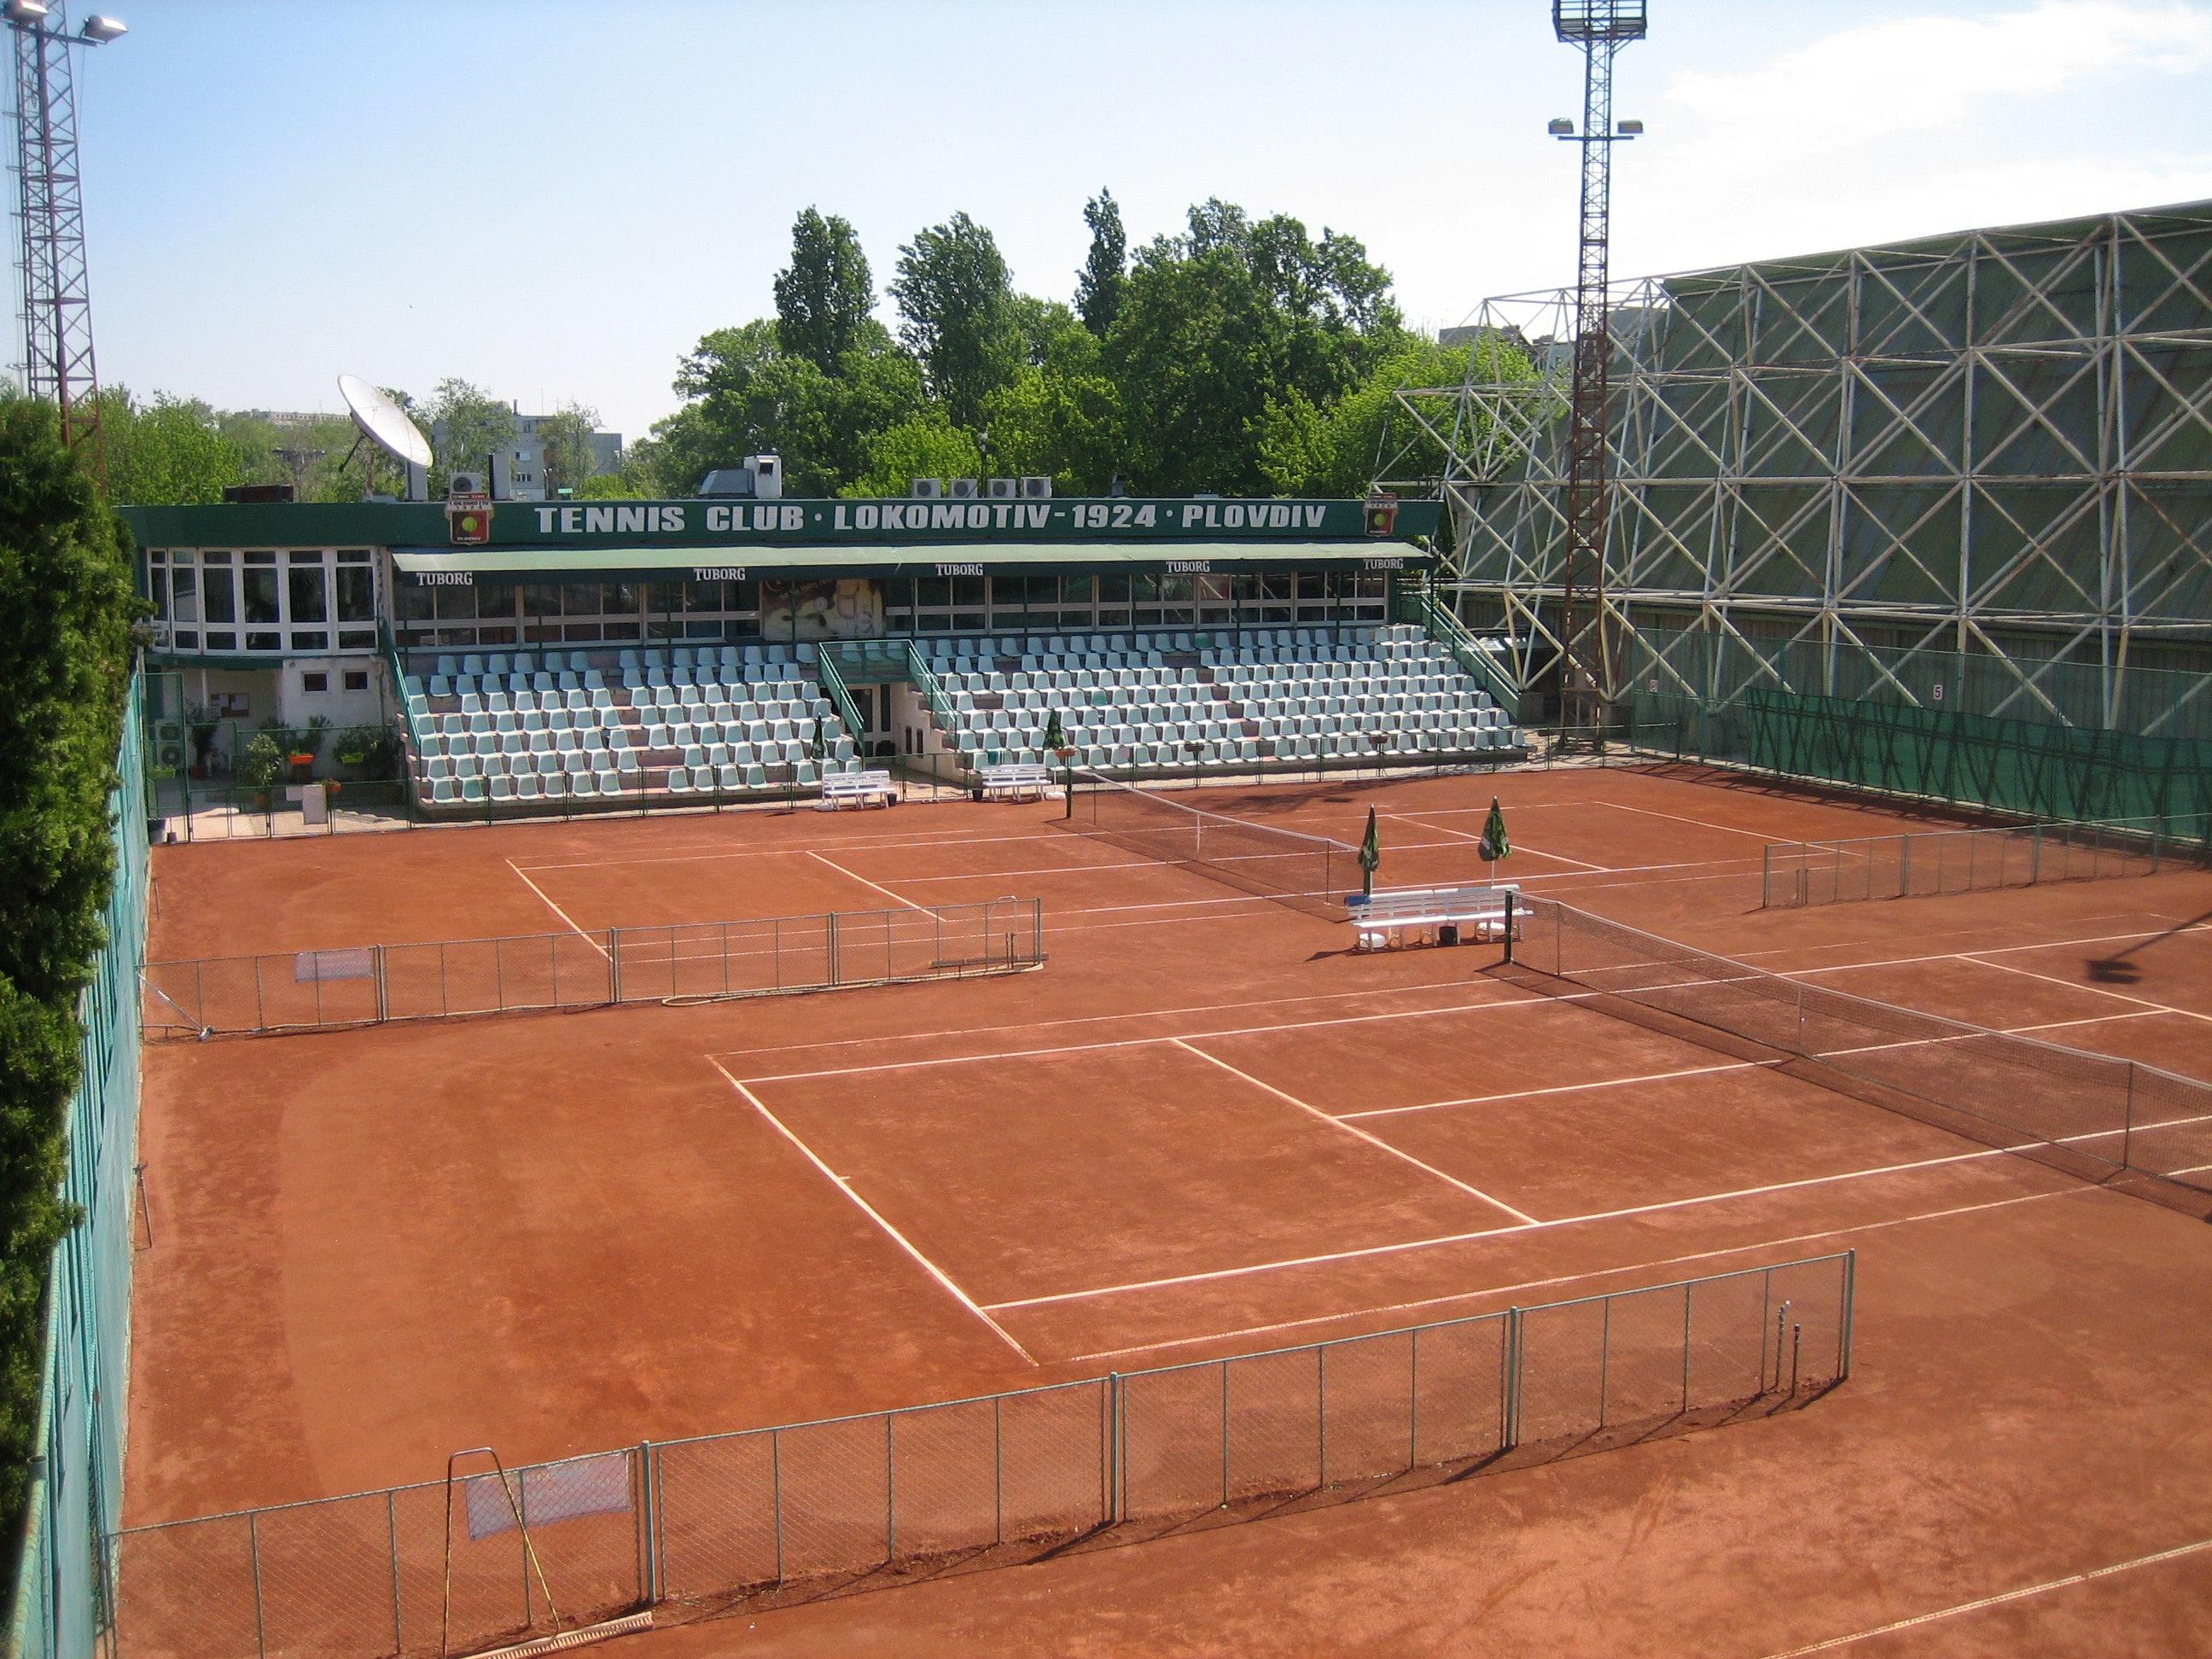 Тенис Клуб Локомотив